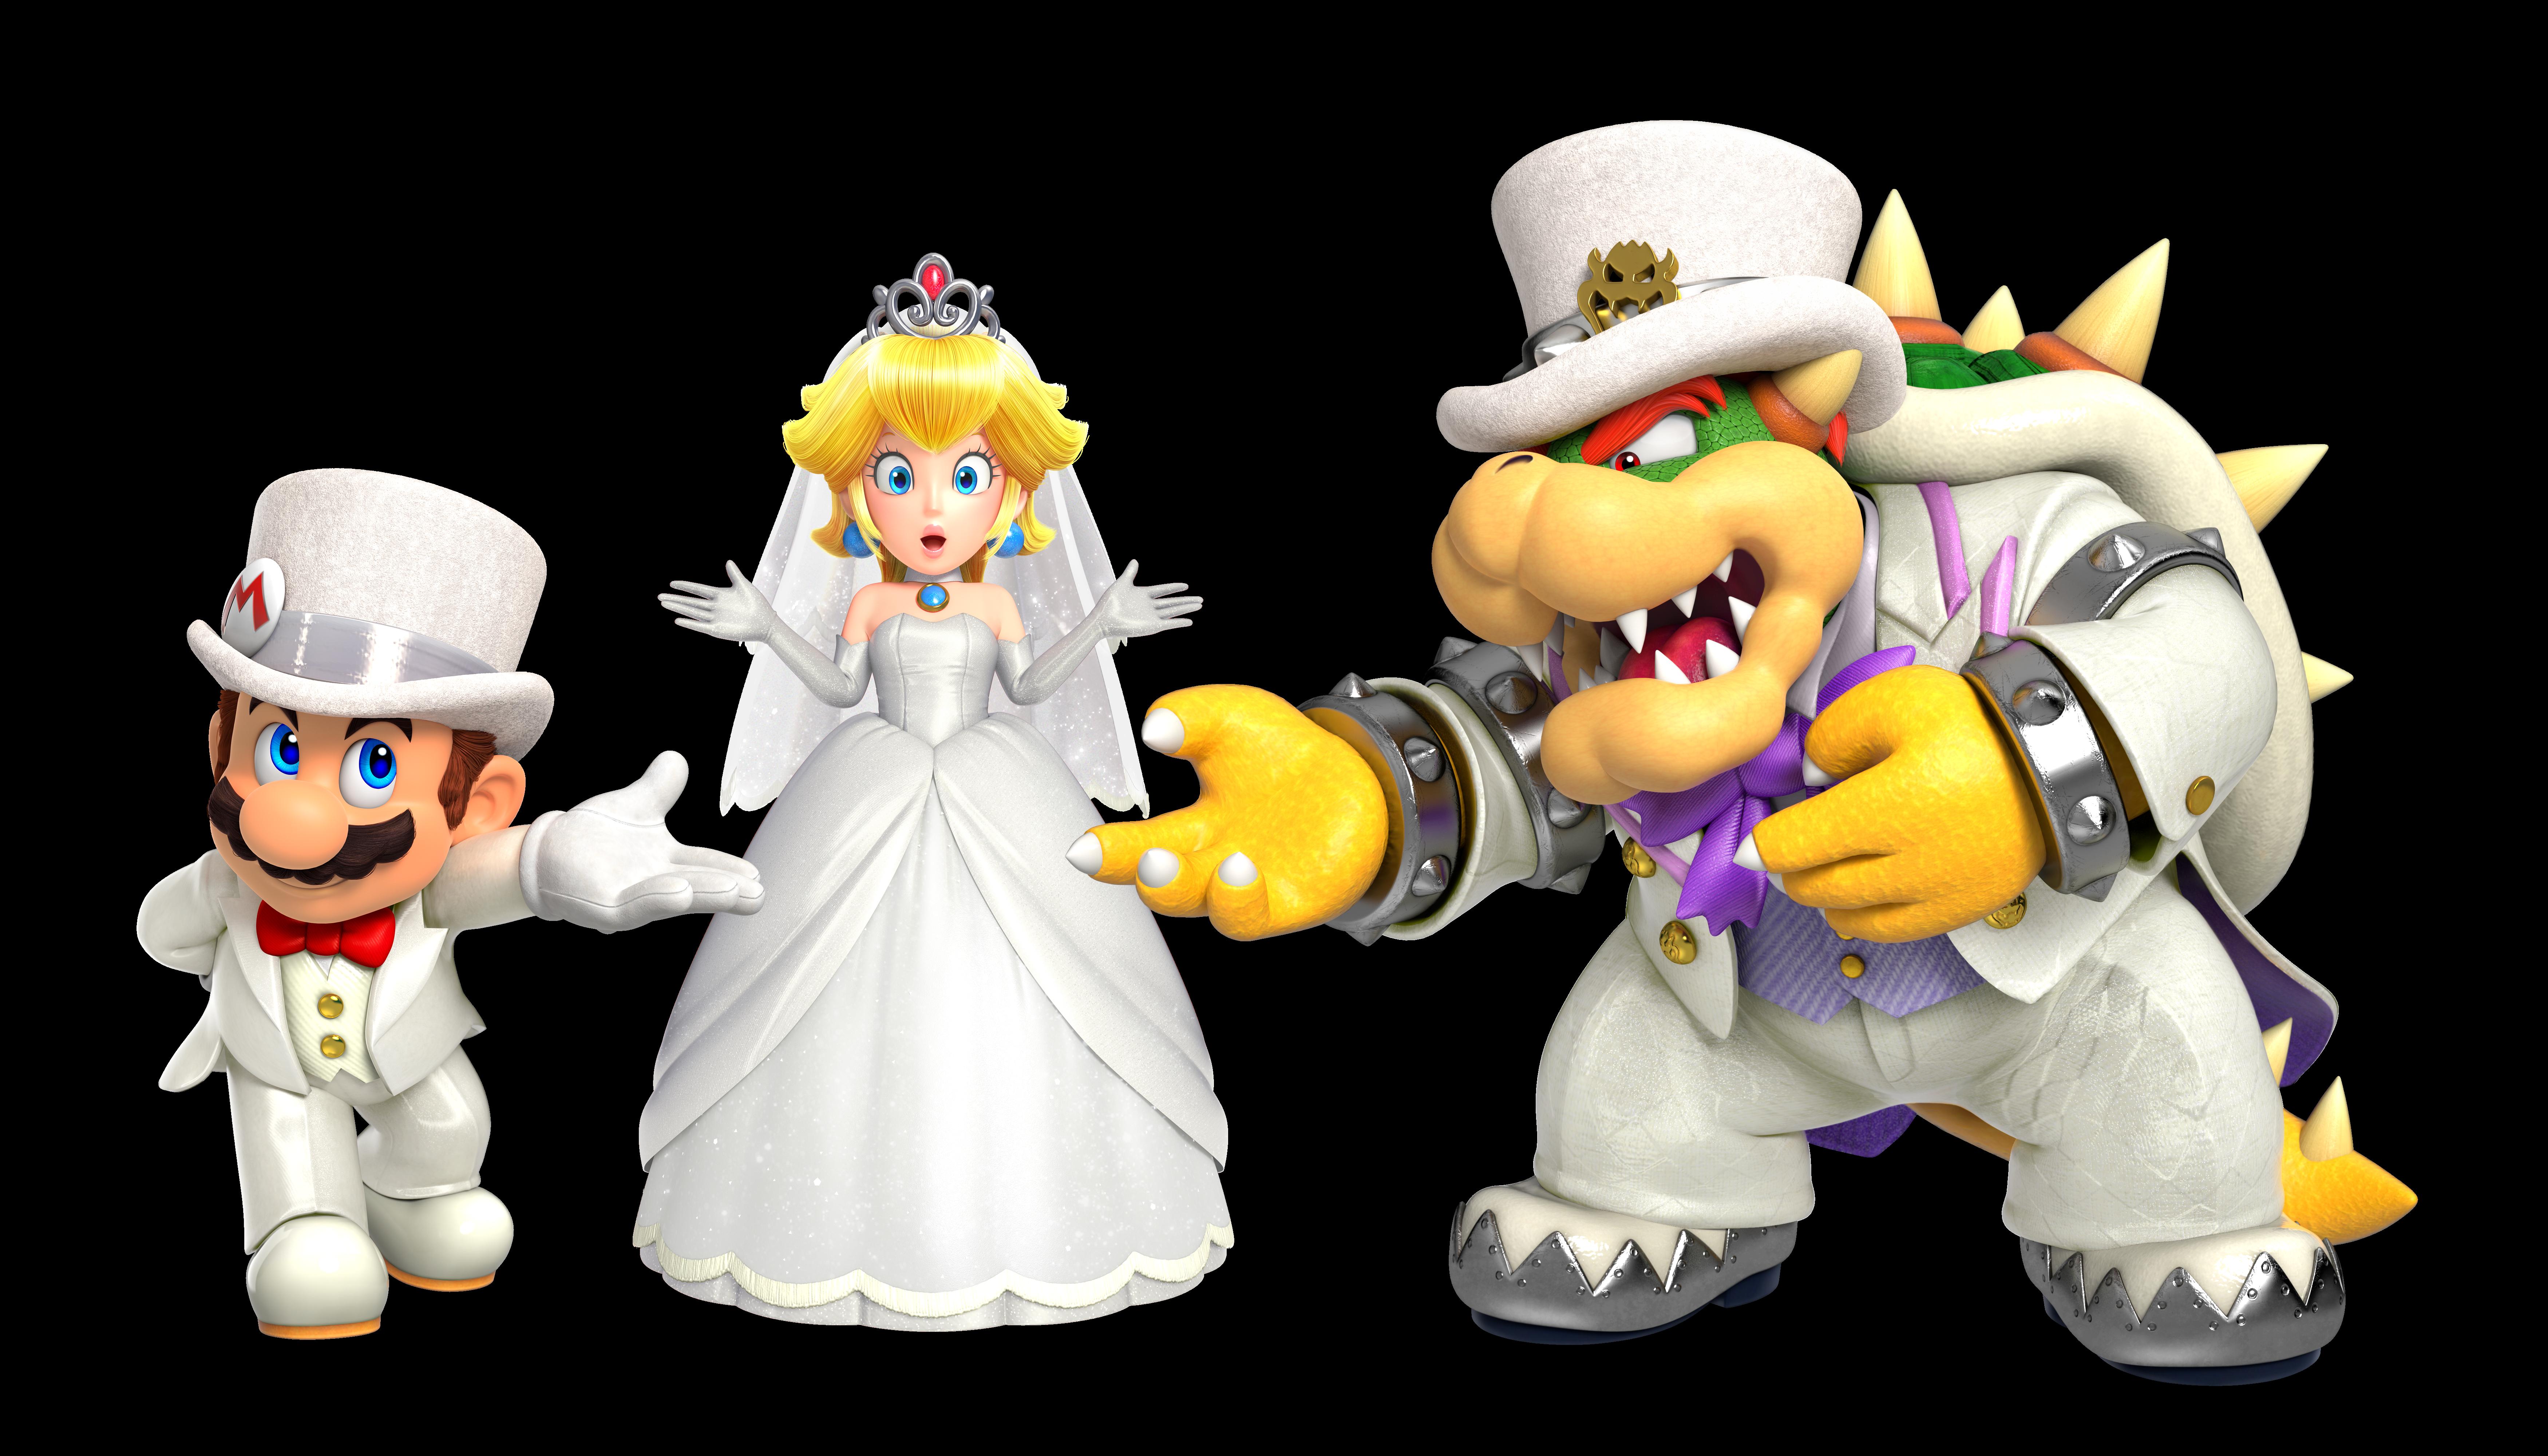 bowser, mario, and princess peach (super mario odyssey and